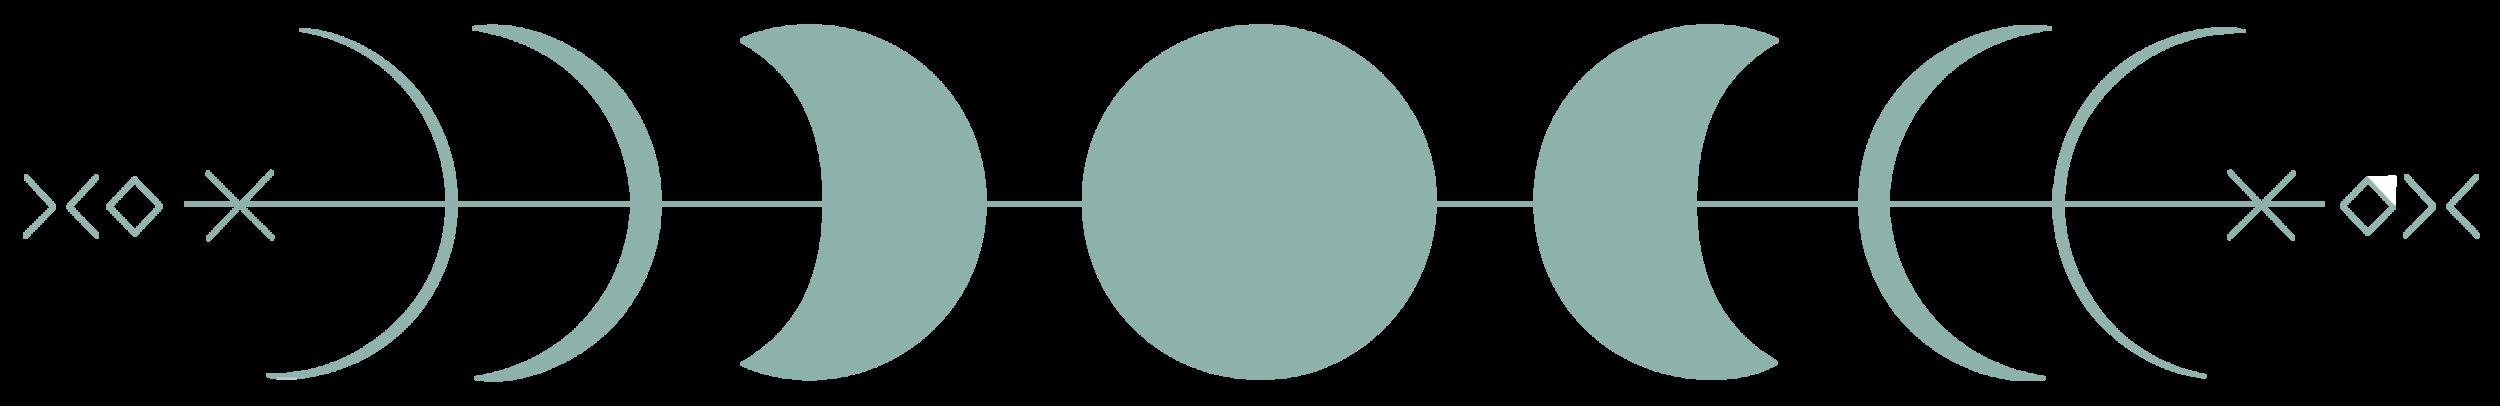 FMM logo cutout-01.png